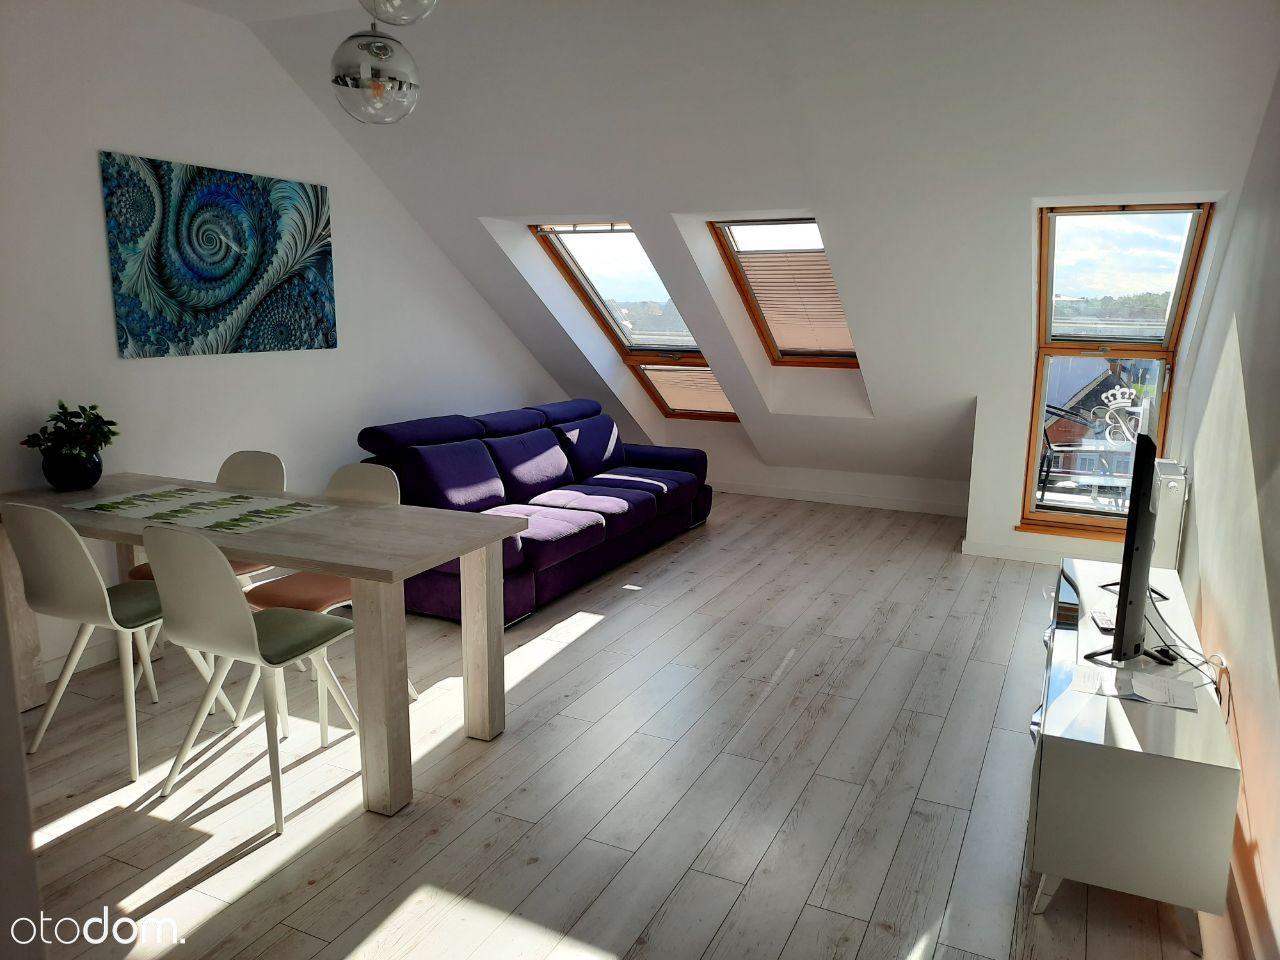 Apartament nad morzem, 2 pokoje, balkon, nr 37